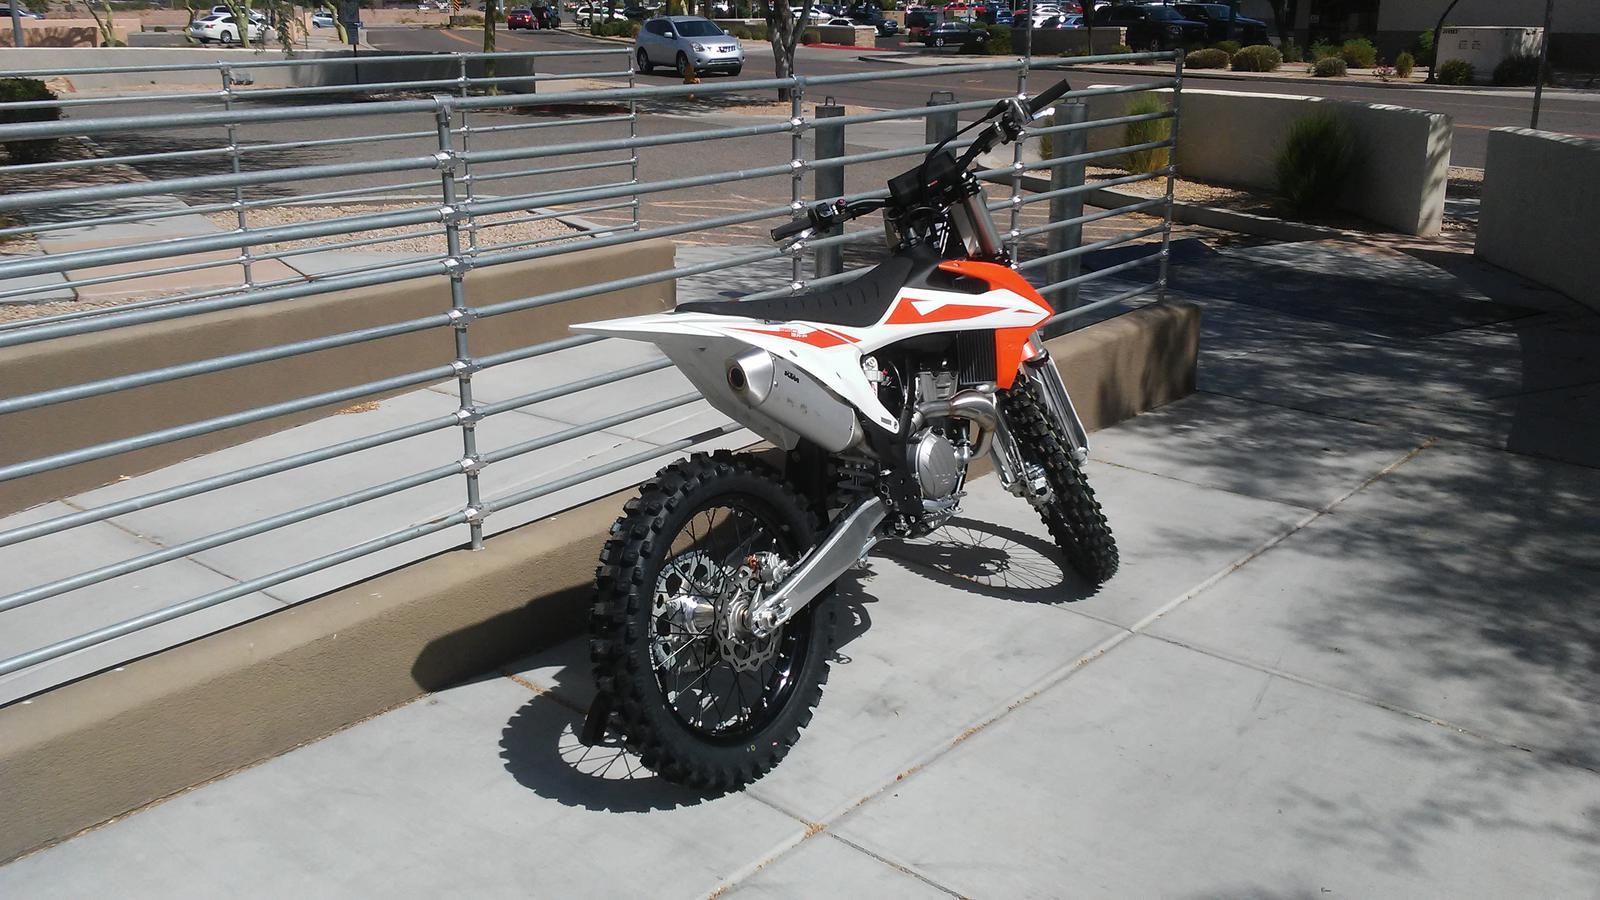 2019 KTM 350 SX-F for sale in Peoria, AZ   GO AZ Motorcycles